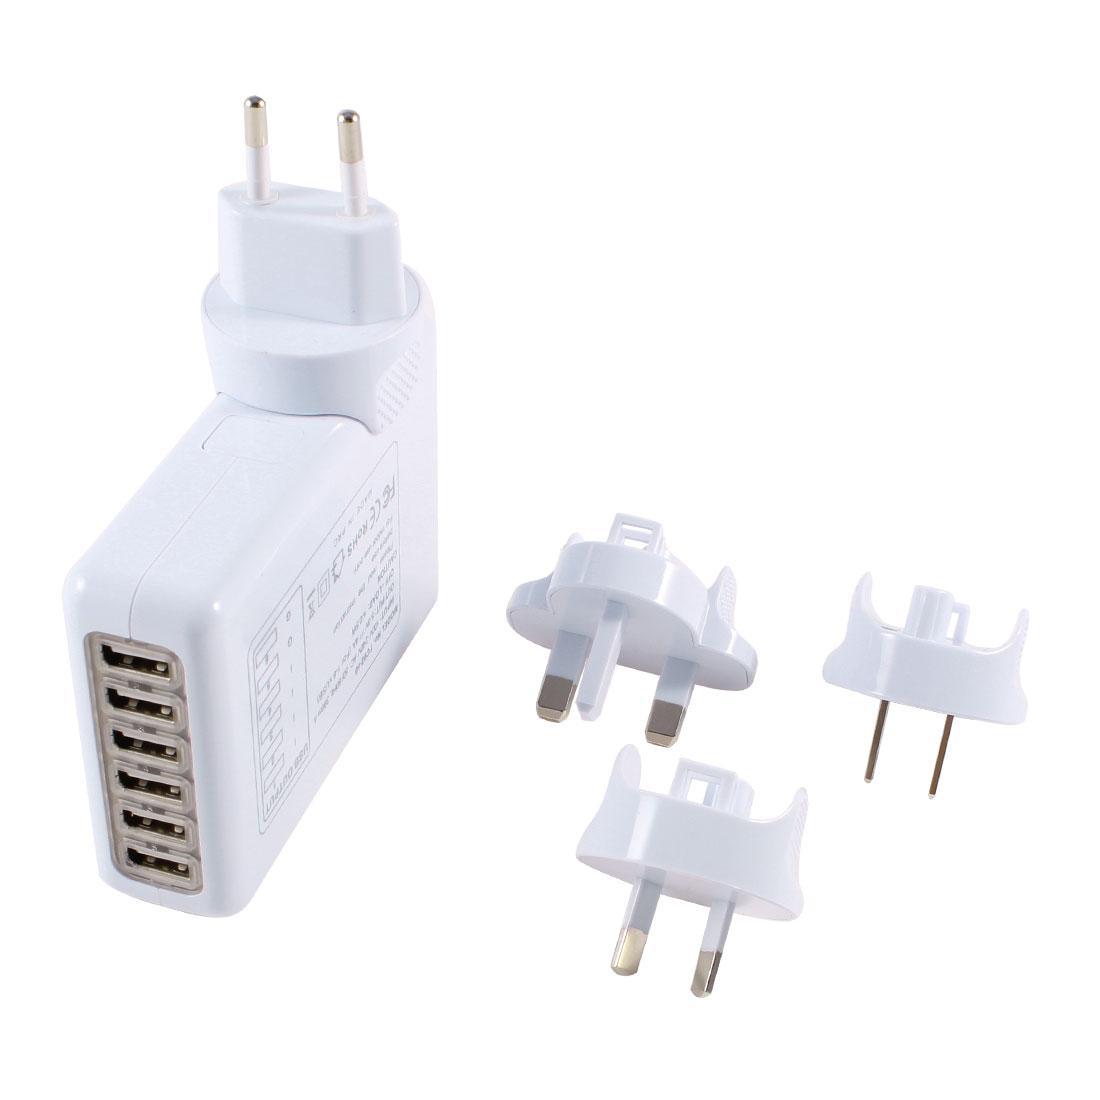 6 Ports USB Hub Home Wall Adapter UK AU EU US Travel AC Charger White